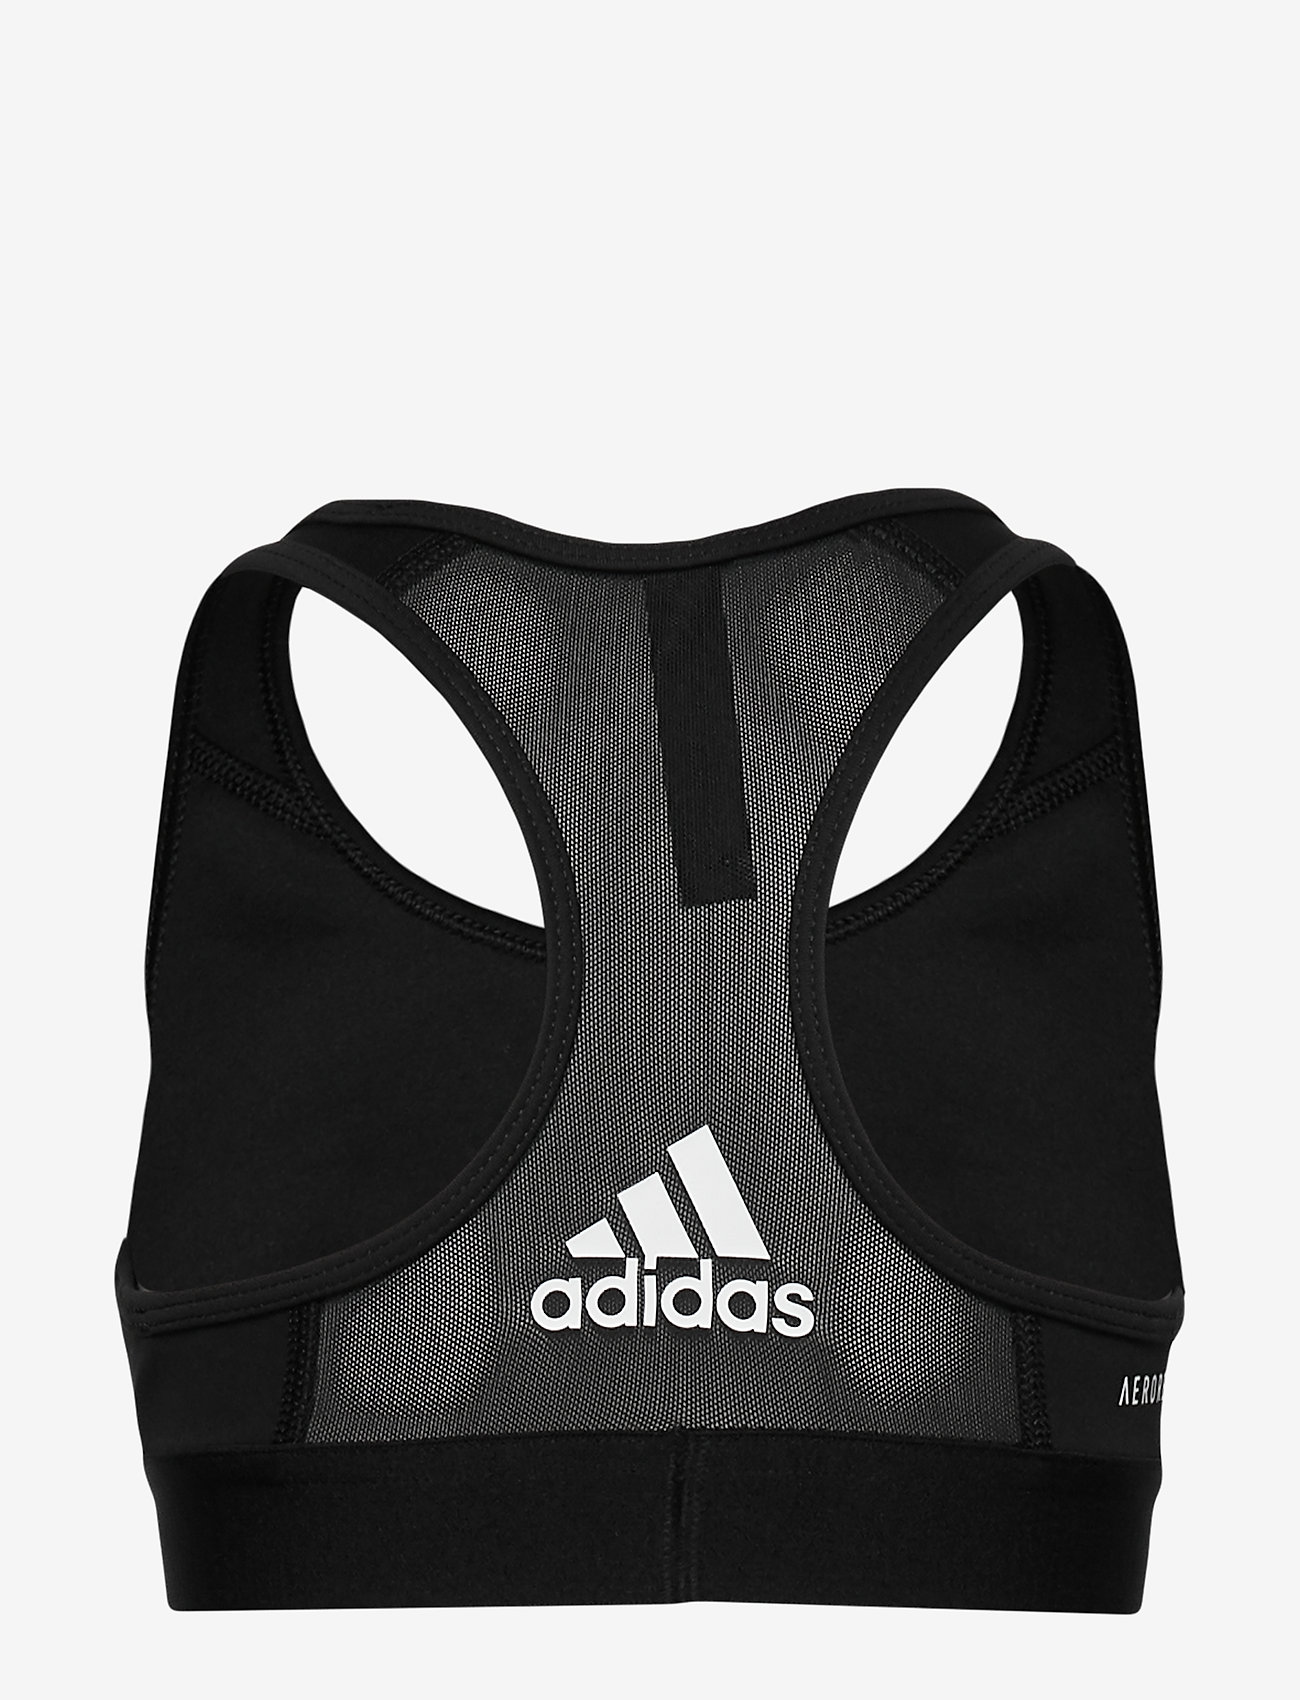 adidas Performance - JG TR ASK BRA - tops - black/white - 1